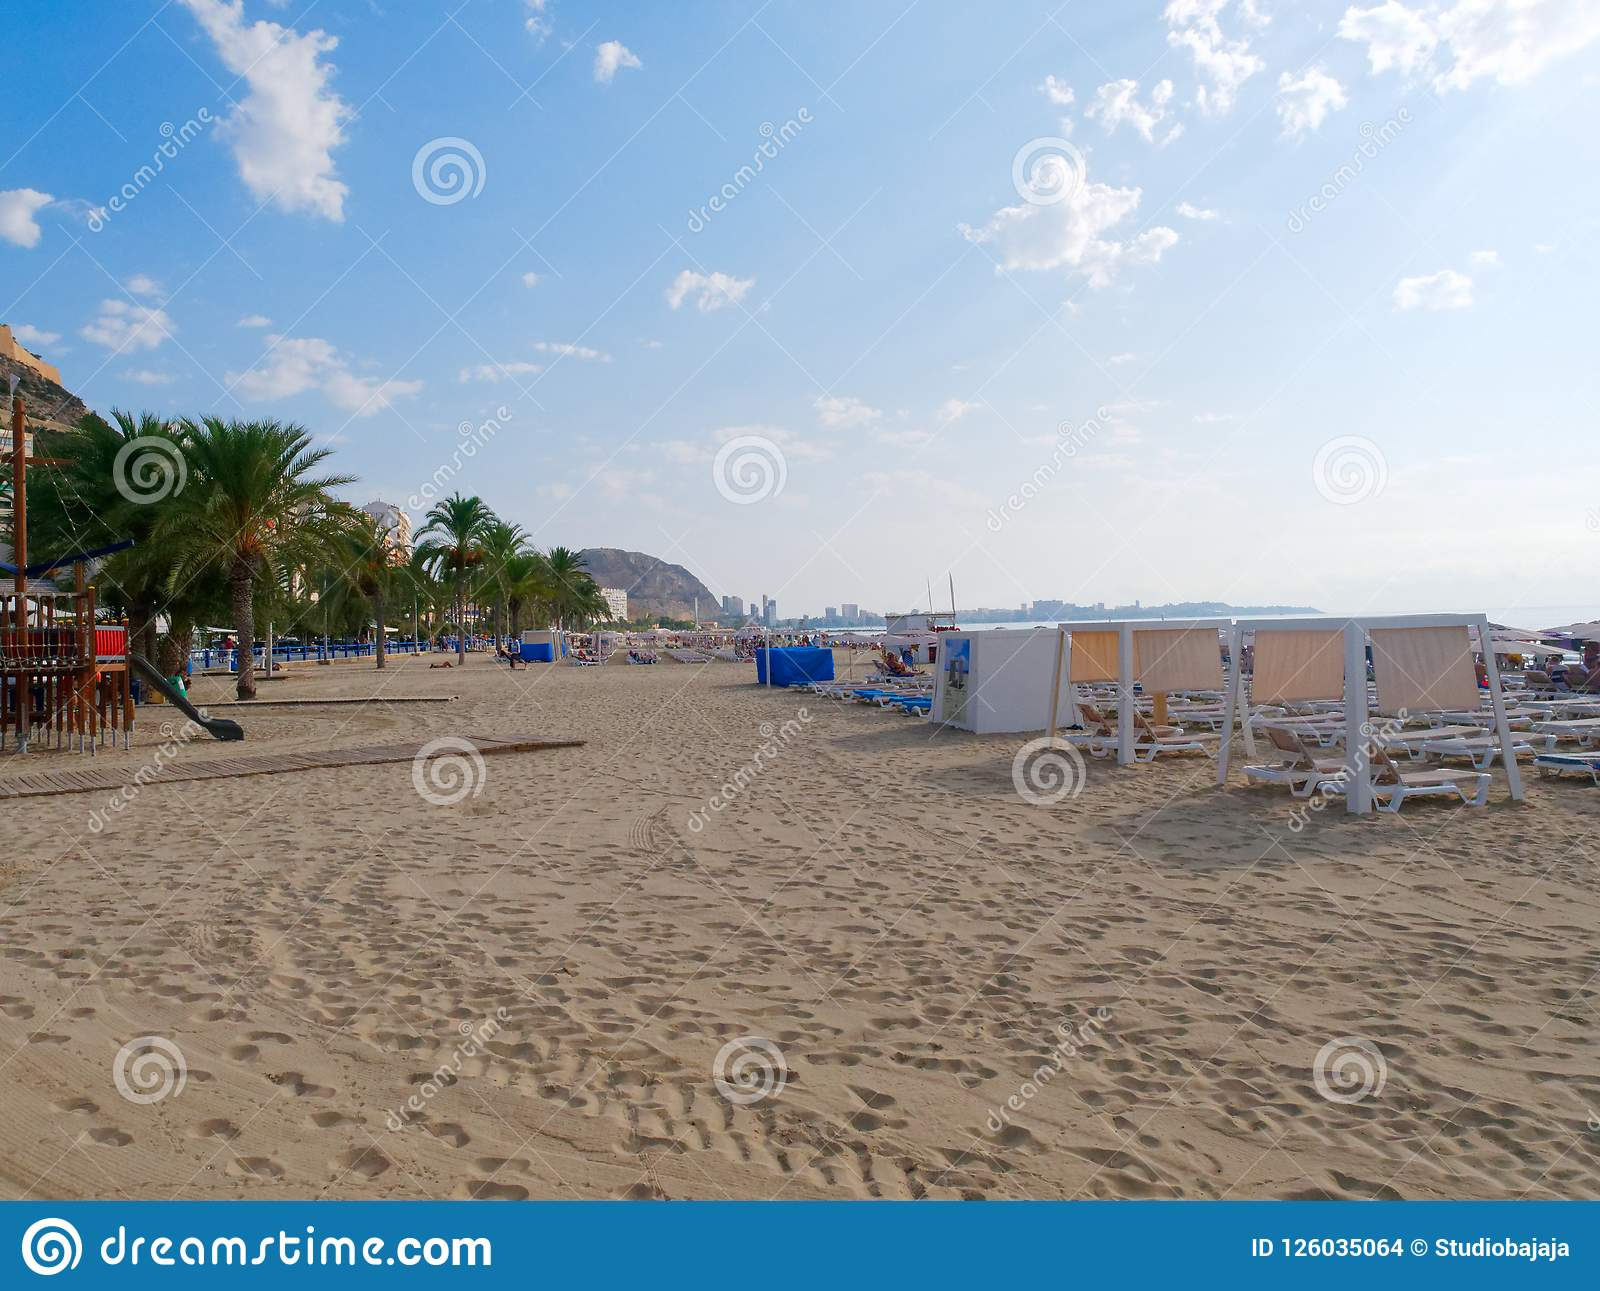 View of the beach Playa del Postiguet in Alicante. Spain.